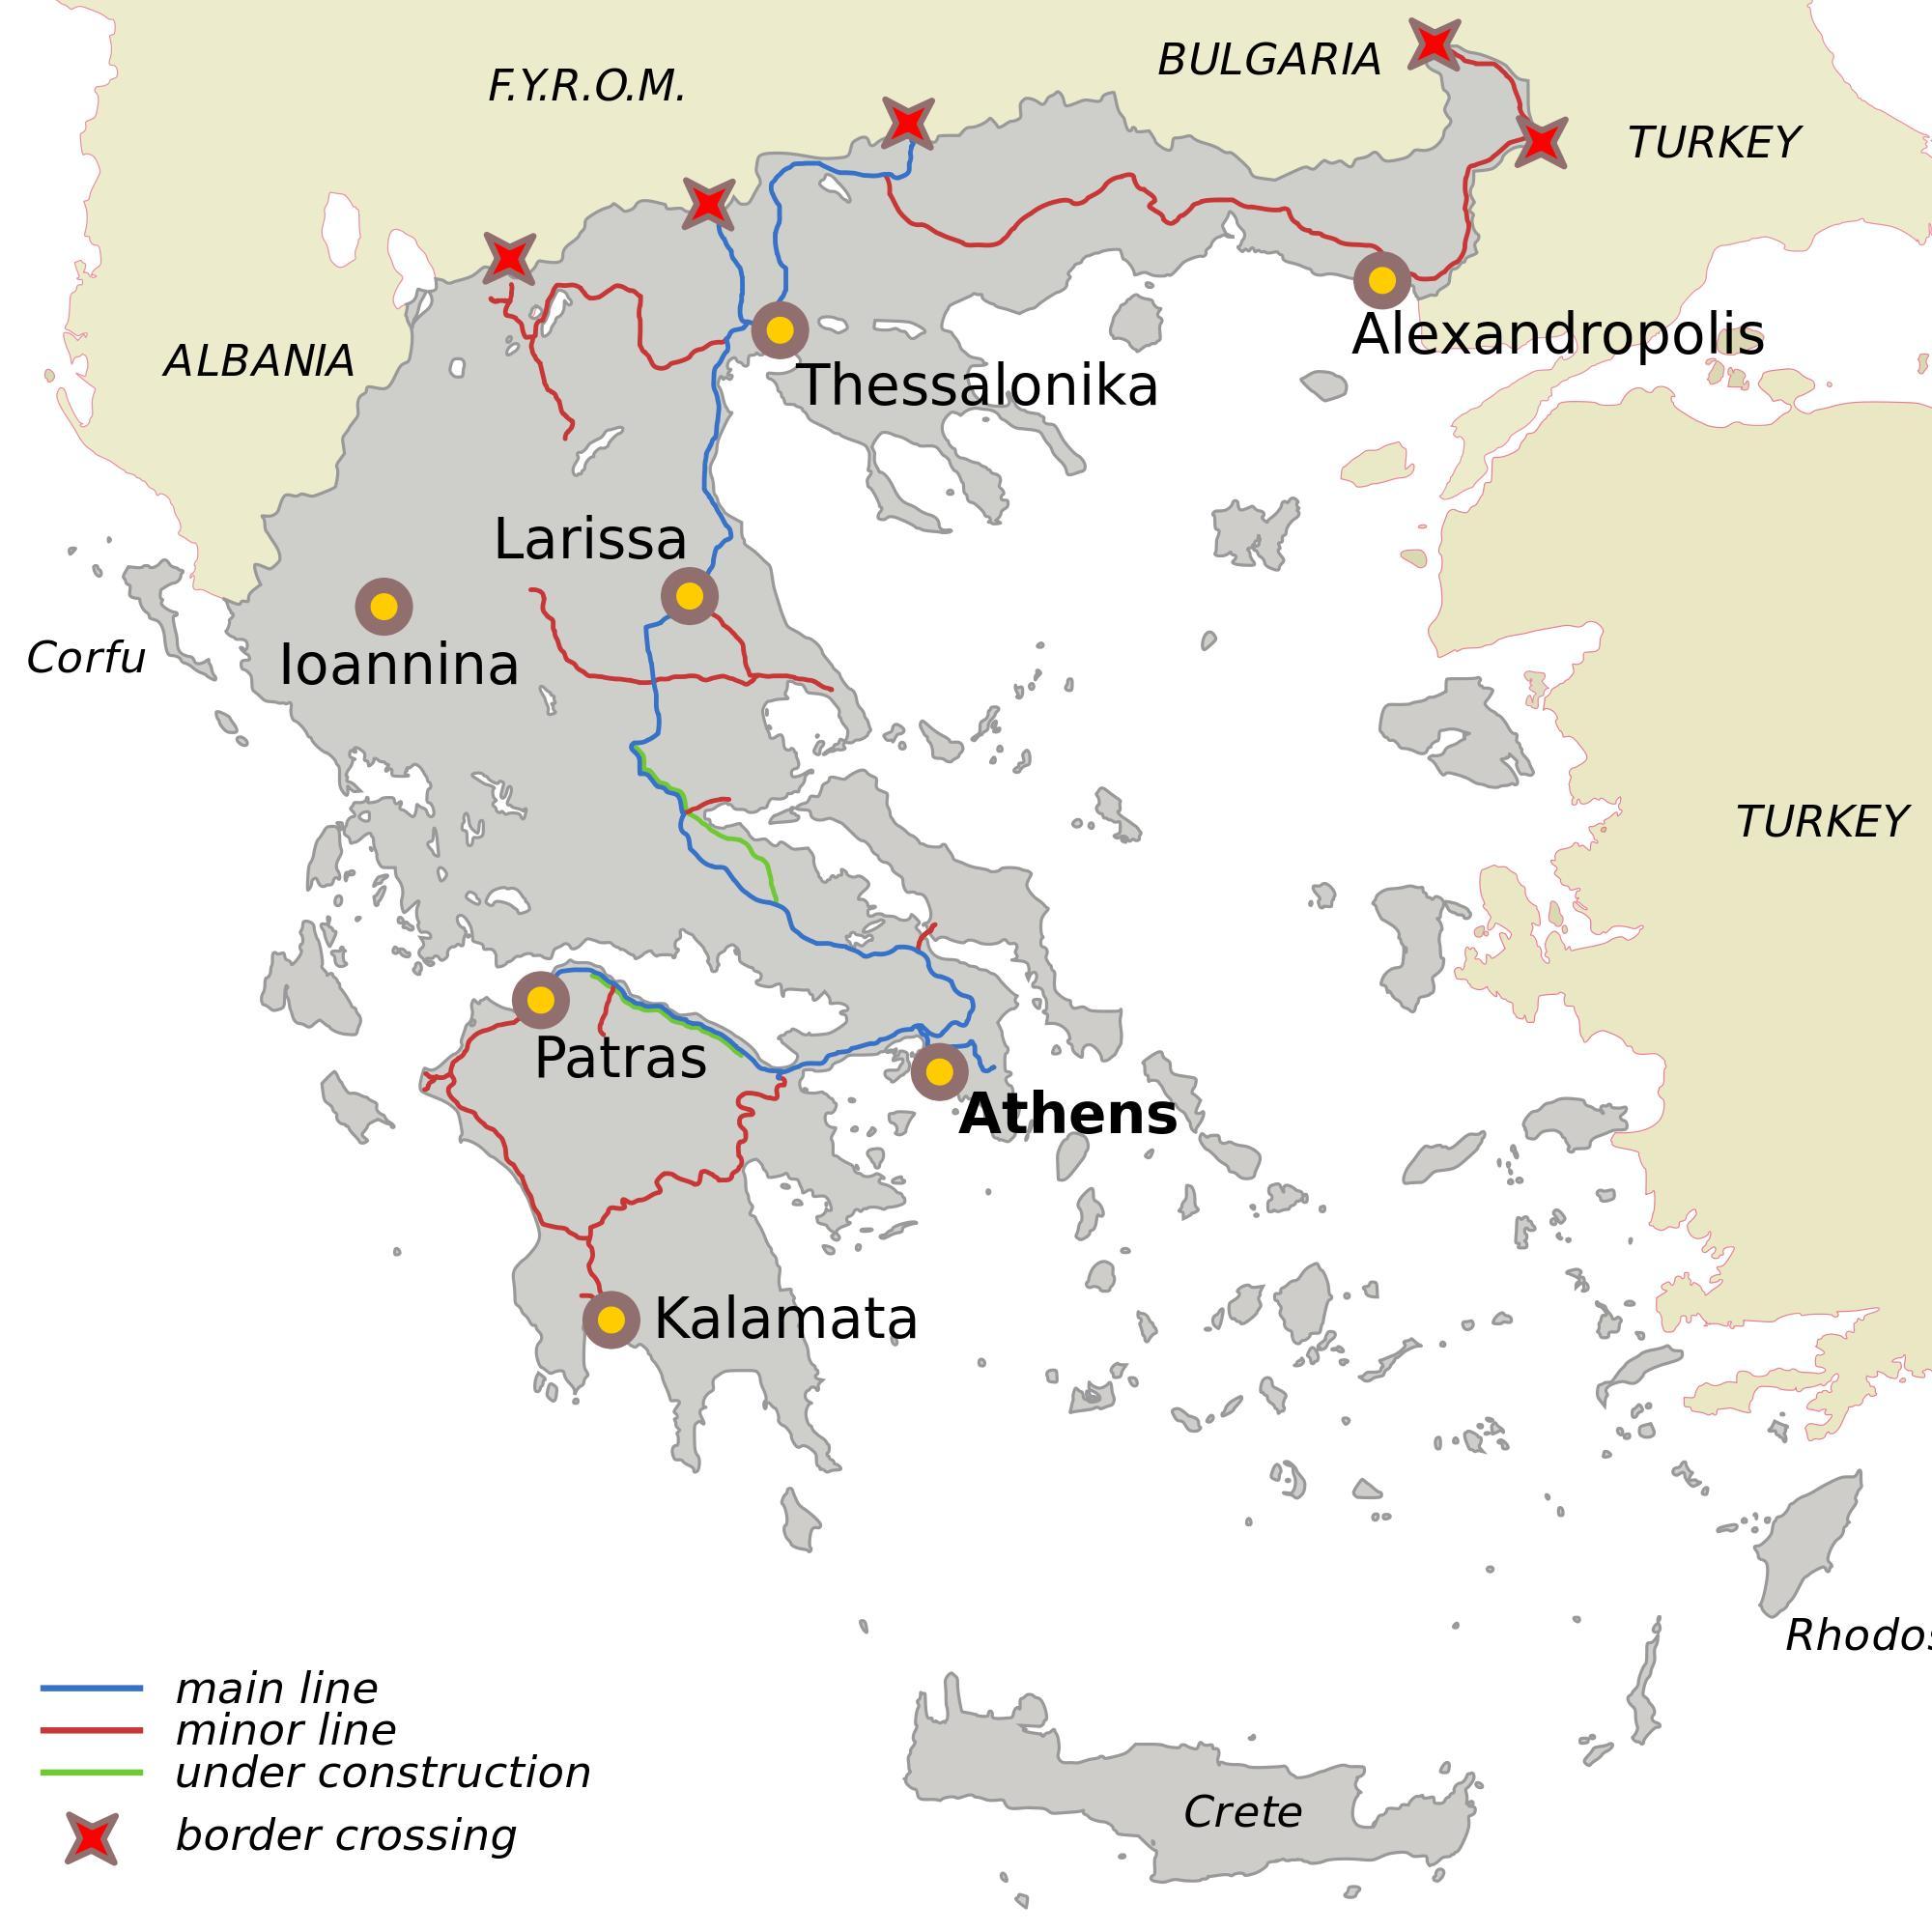 eisenbahn griechenland karte Griechenland Eisenbahn Karte   Griechische Eisenbahnen Karte